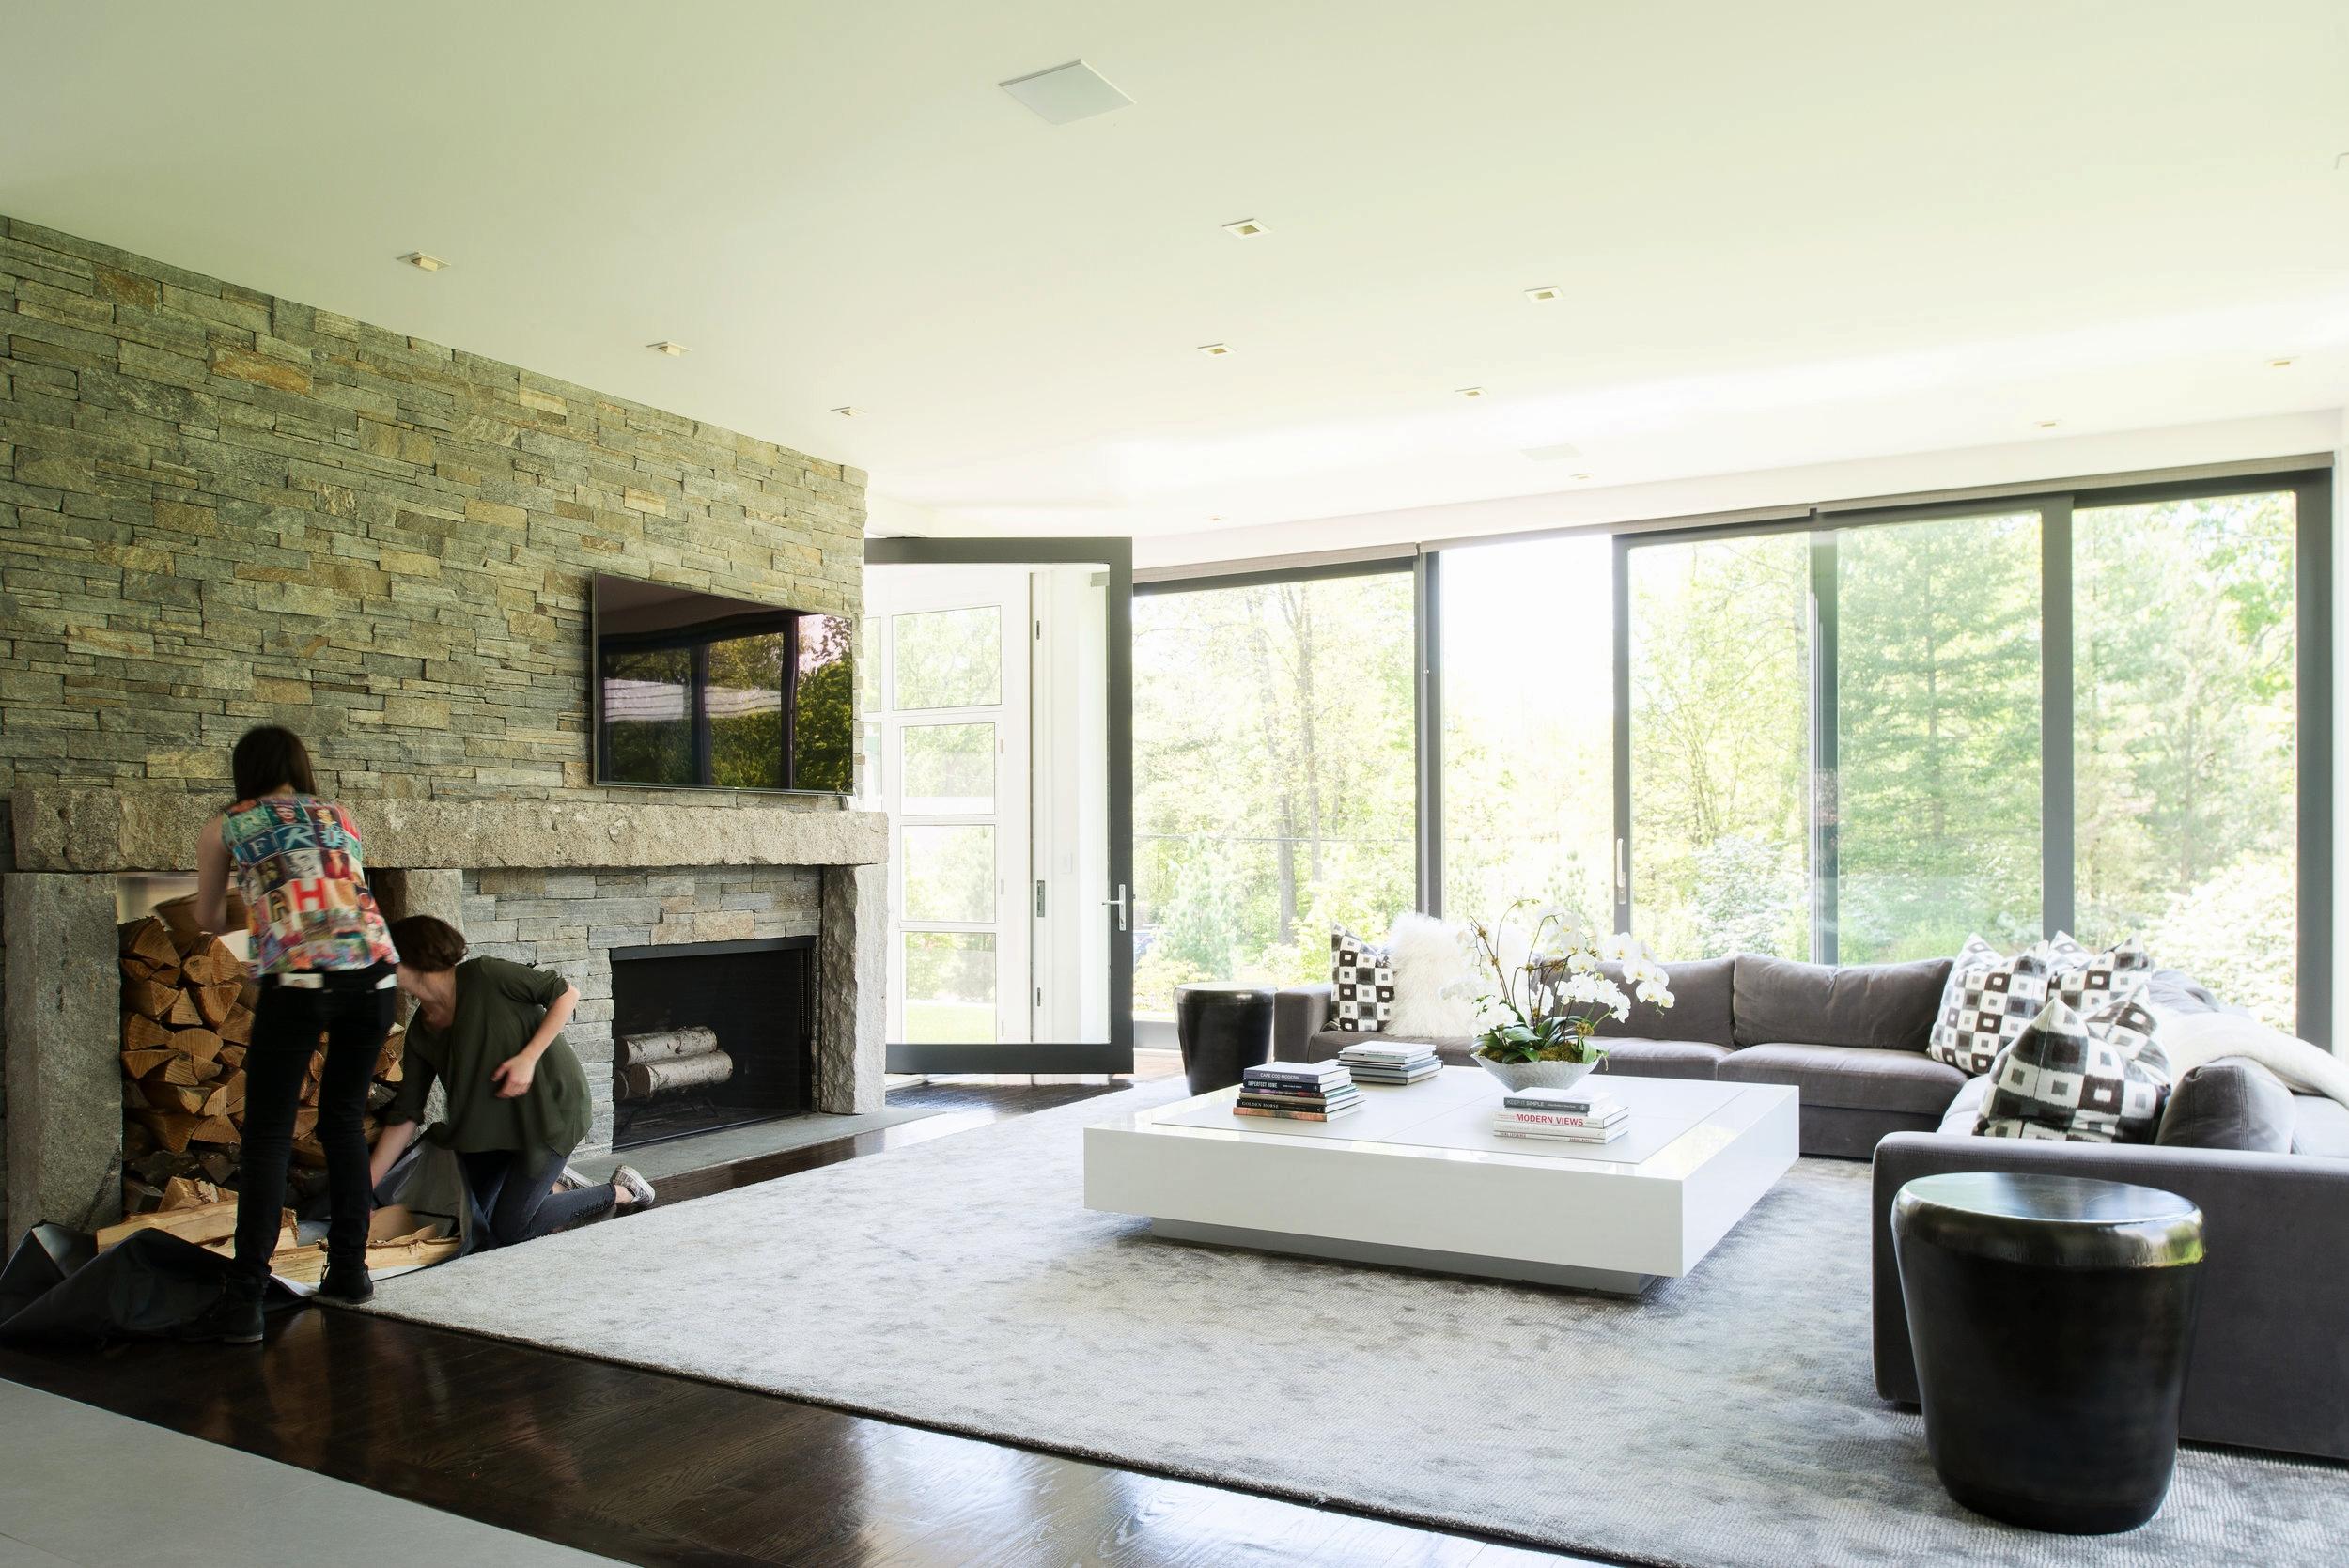 Gwen and Hailey - interior design, home, modern, art, patterns, architecture, windows, contemporary design, photography